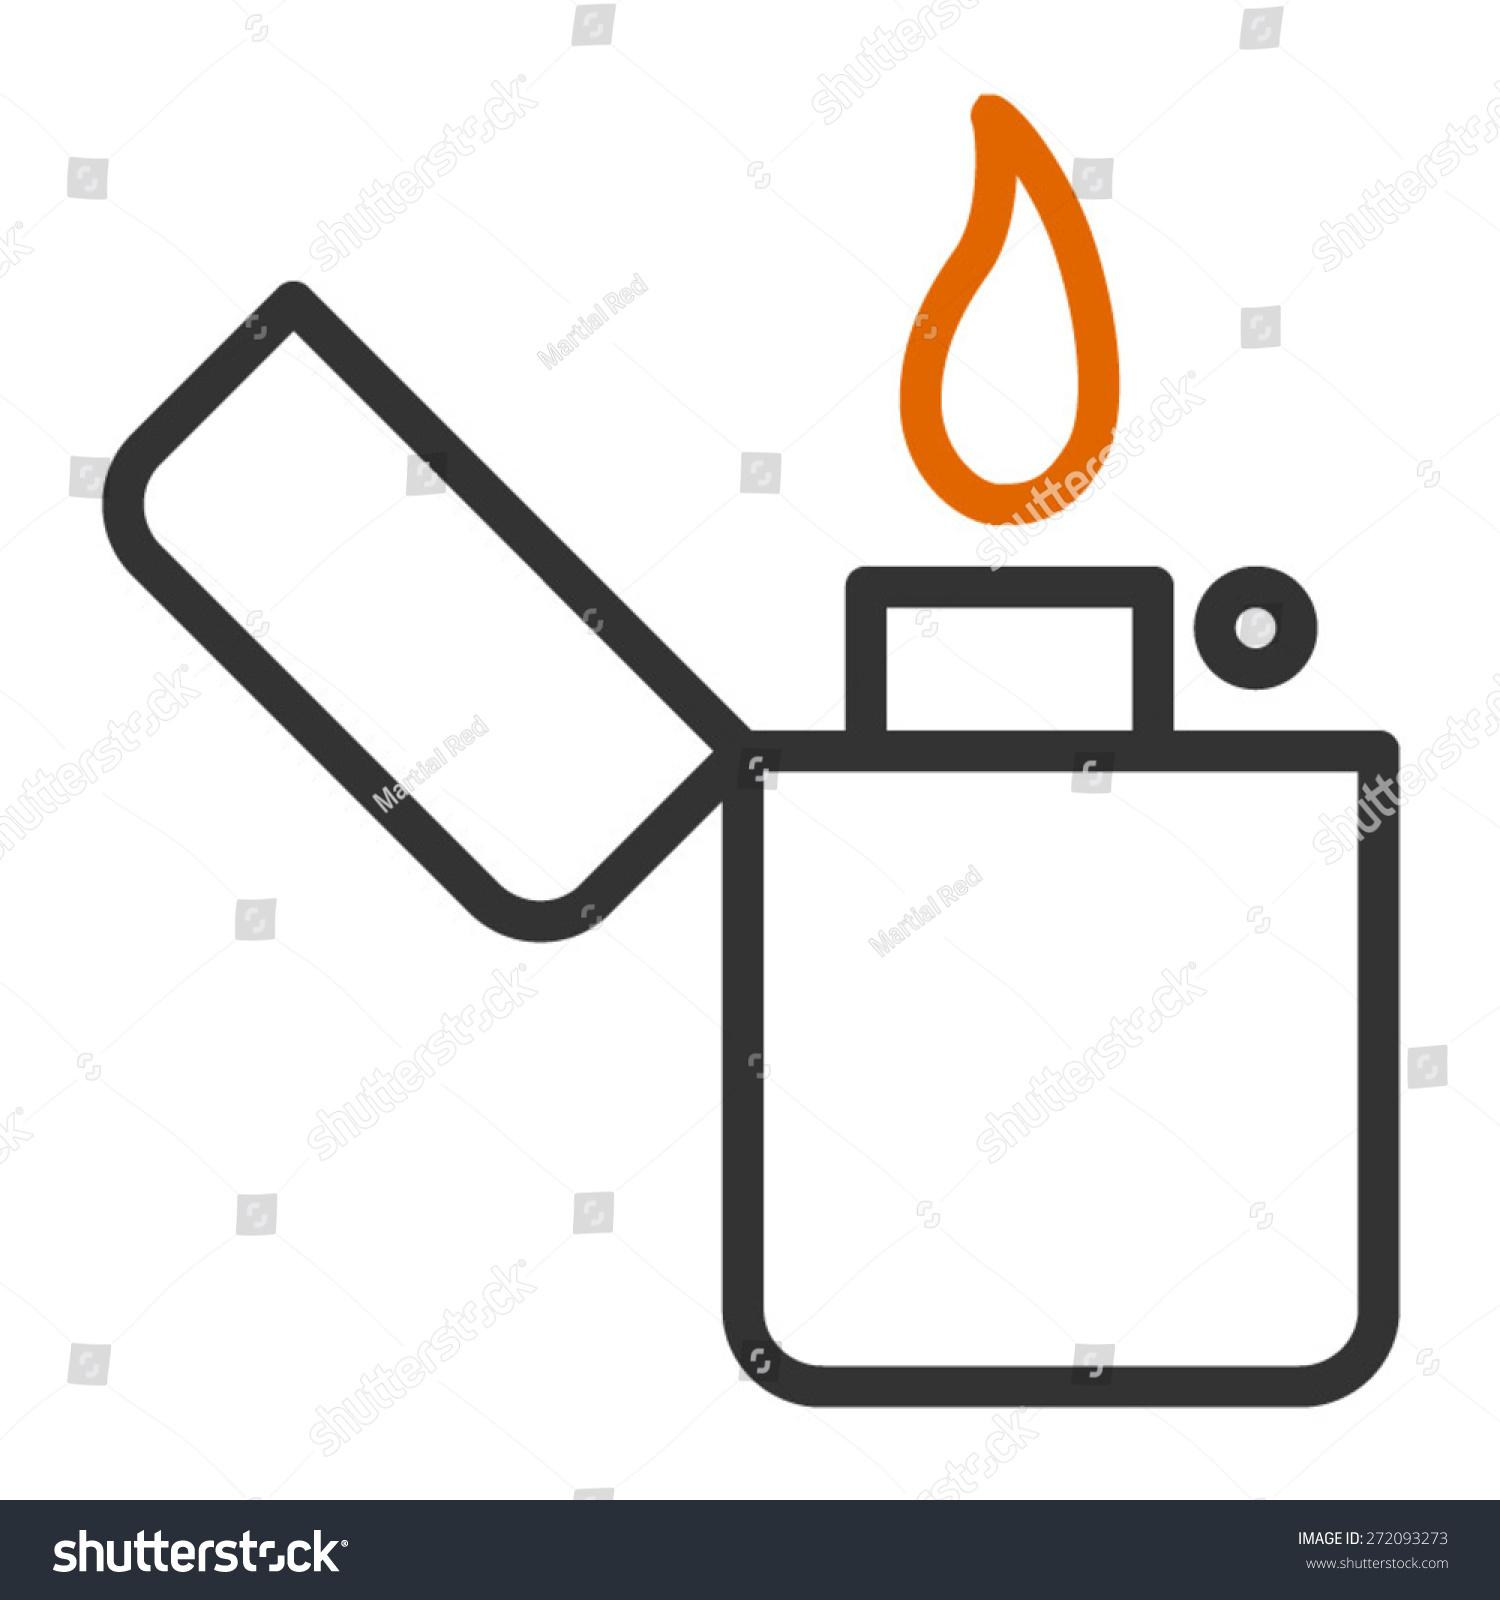 Line Art App : Vintage lighter line art icon apps stock vector